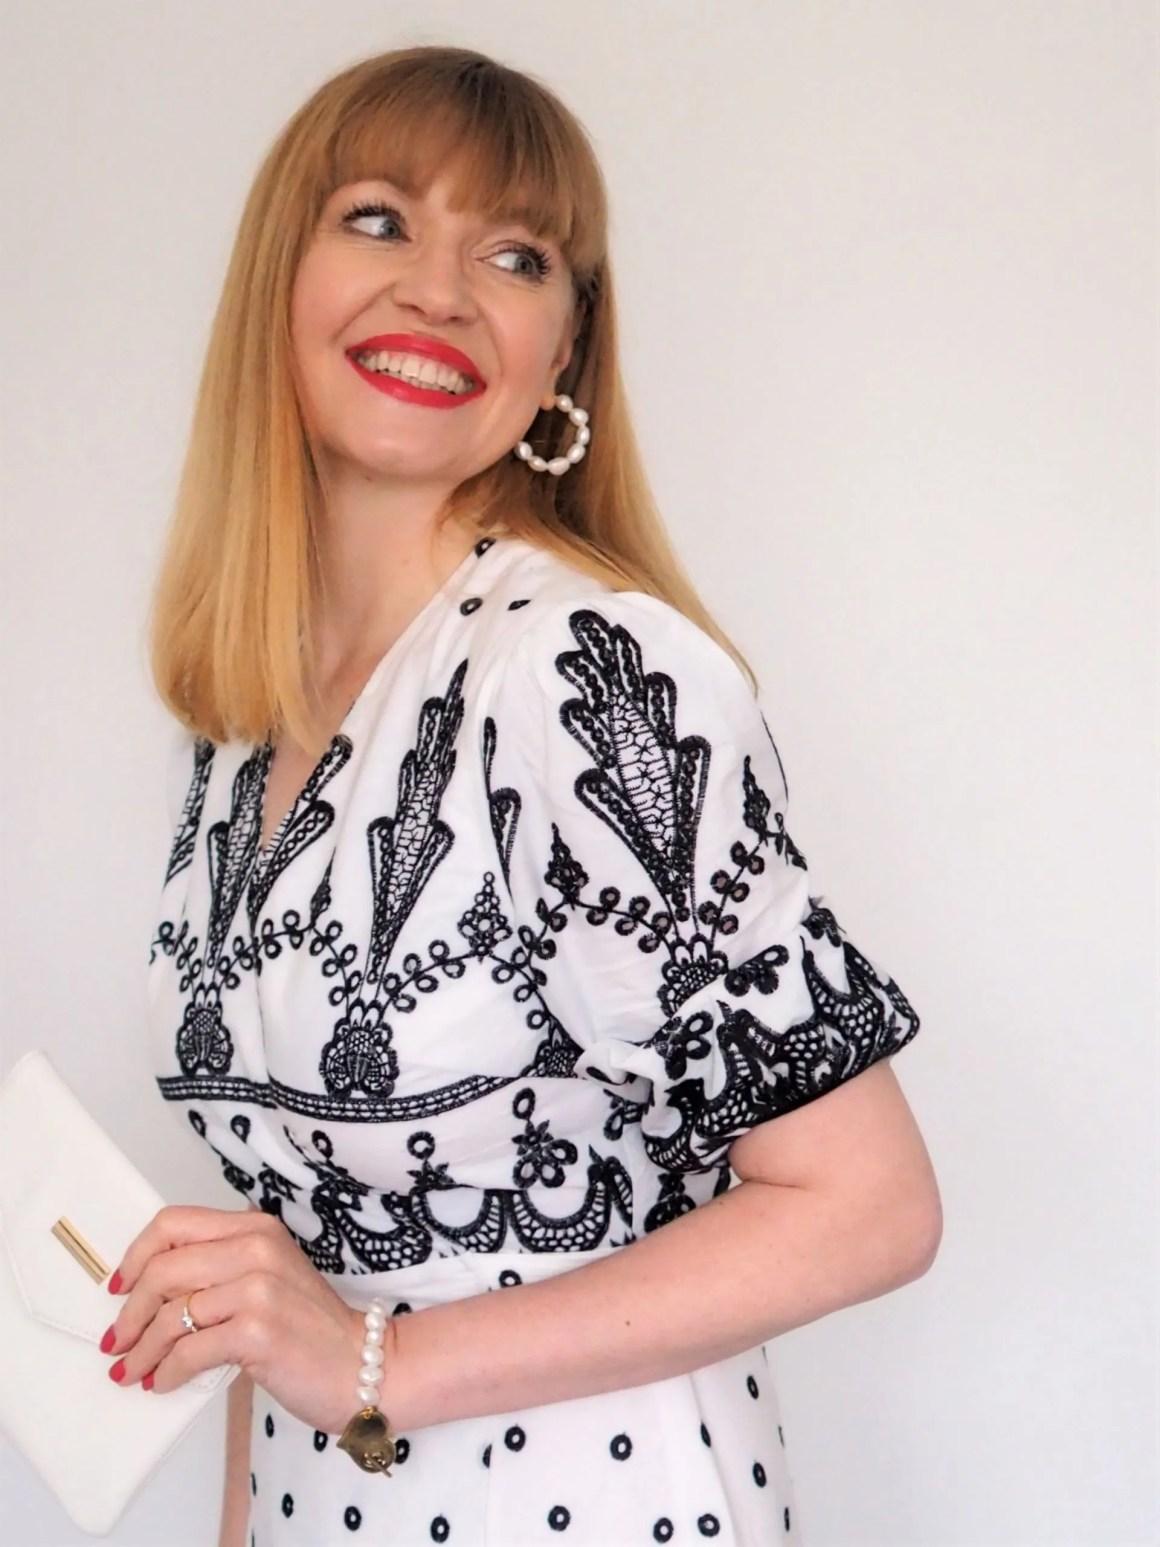 woman wears black and white dress with freshwater pearl hoop earrings